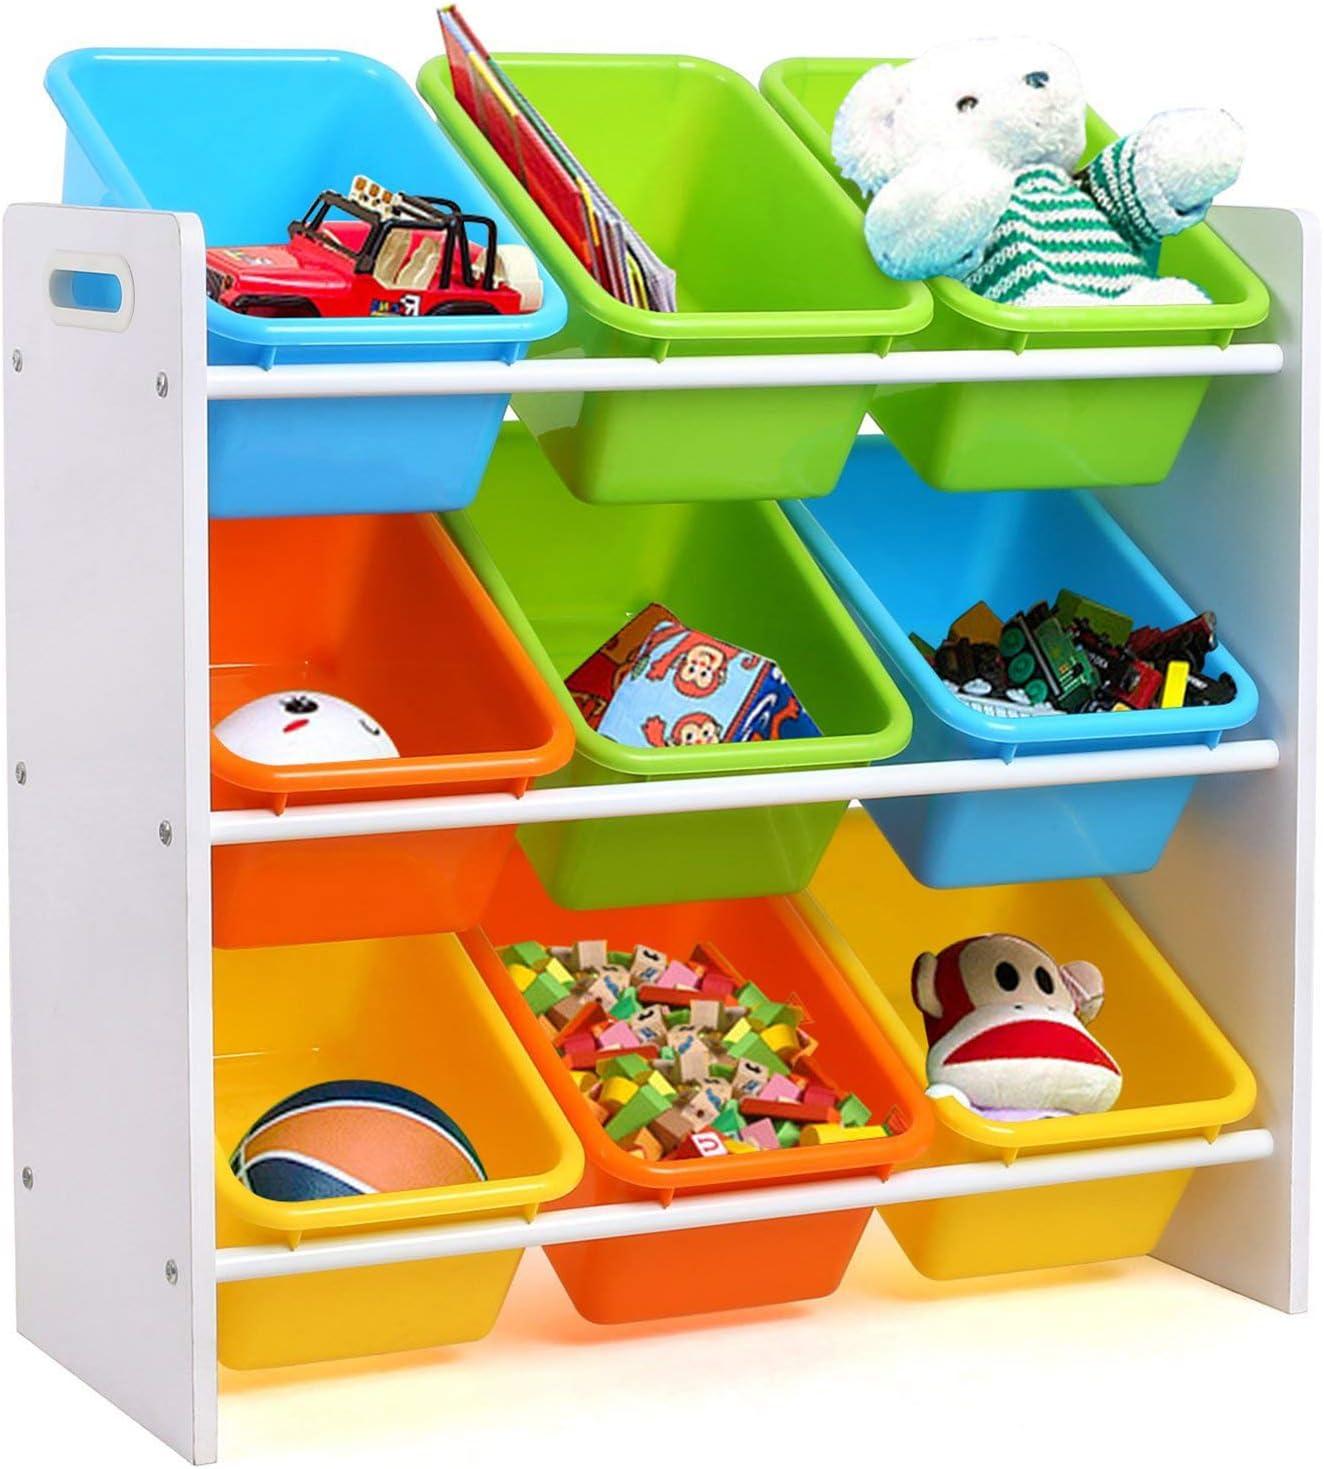 Homfa Estantería Infantil para Juguetes Libros Organizador Infantil de Juguetes Almacenamiento Juguetes con 9 Cajones 65 x 26.5 x 60cm